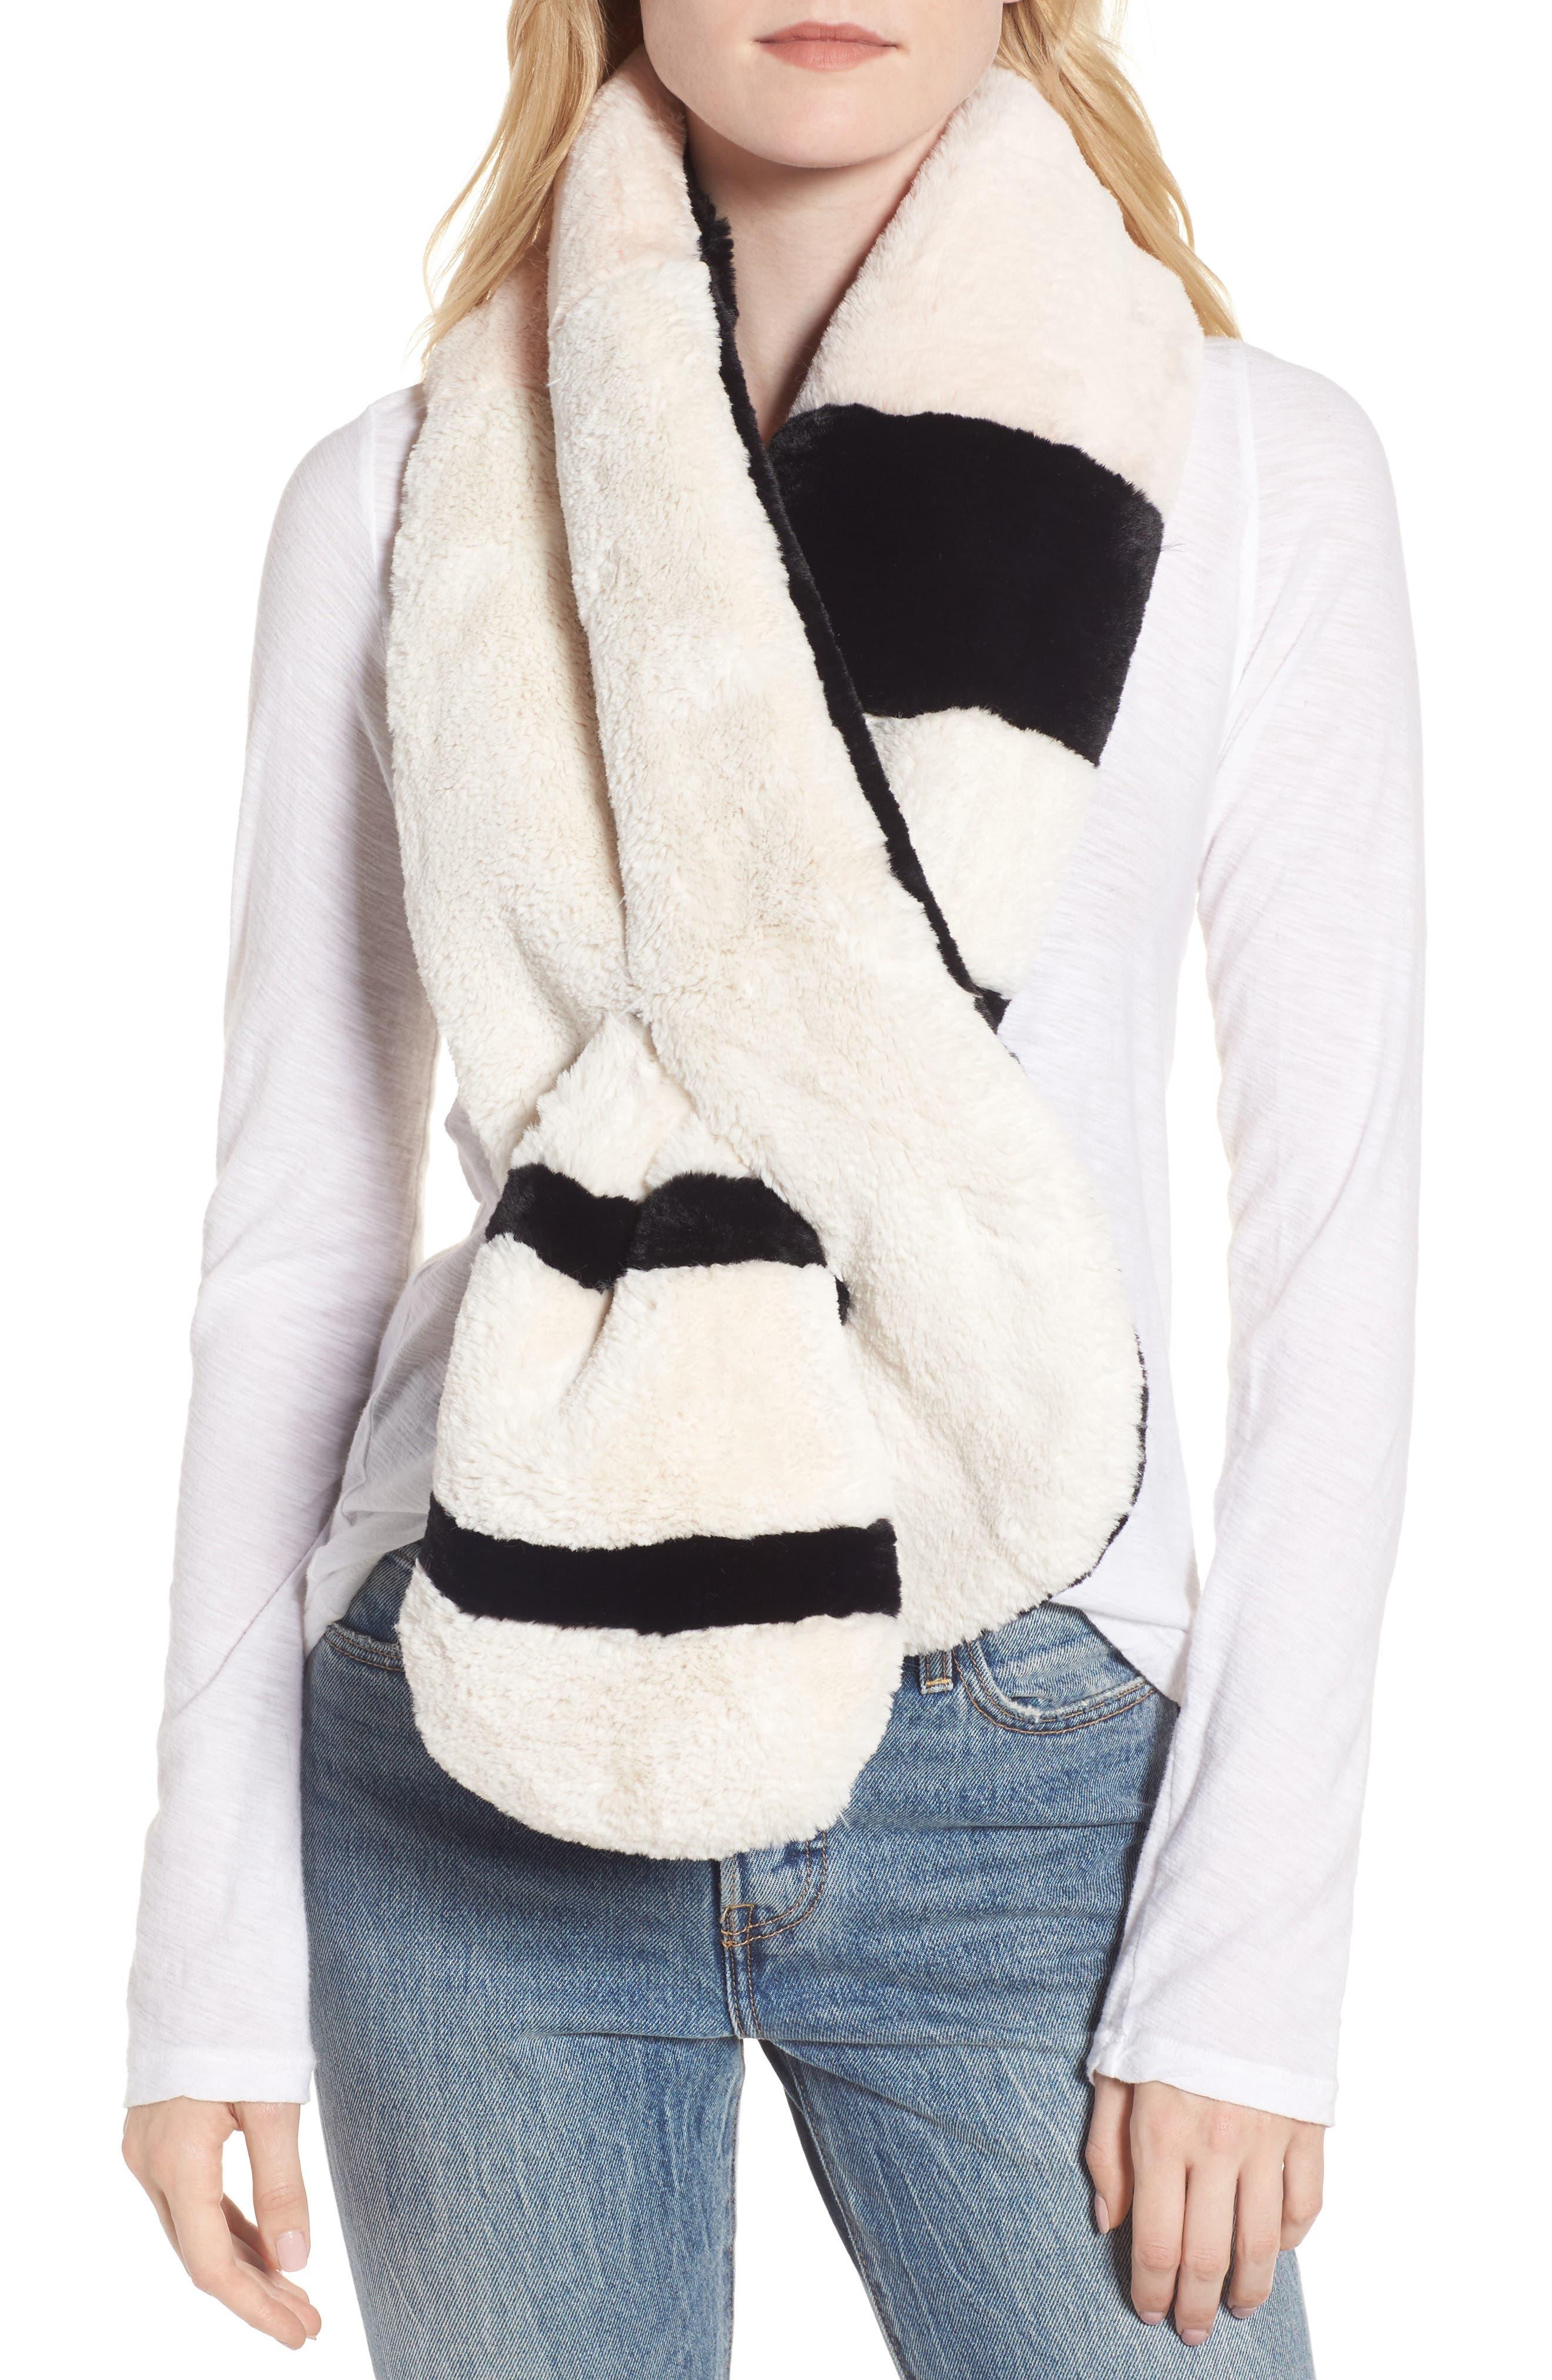 Main Image - Heurueh Colorblock Faux Fur Pull Through Scarf